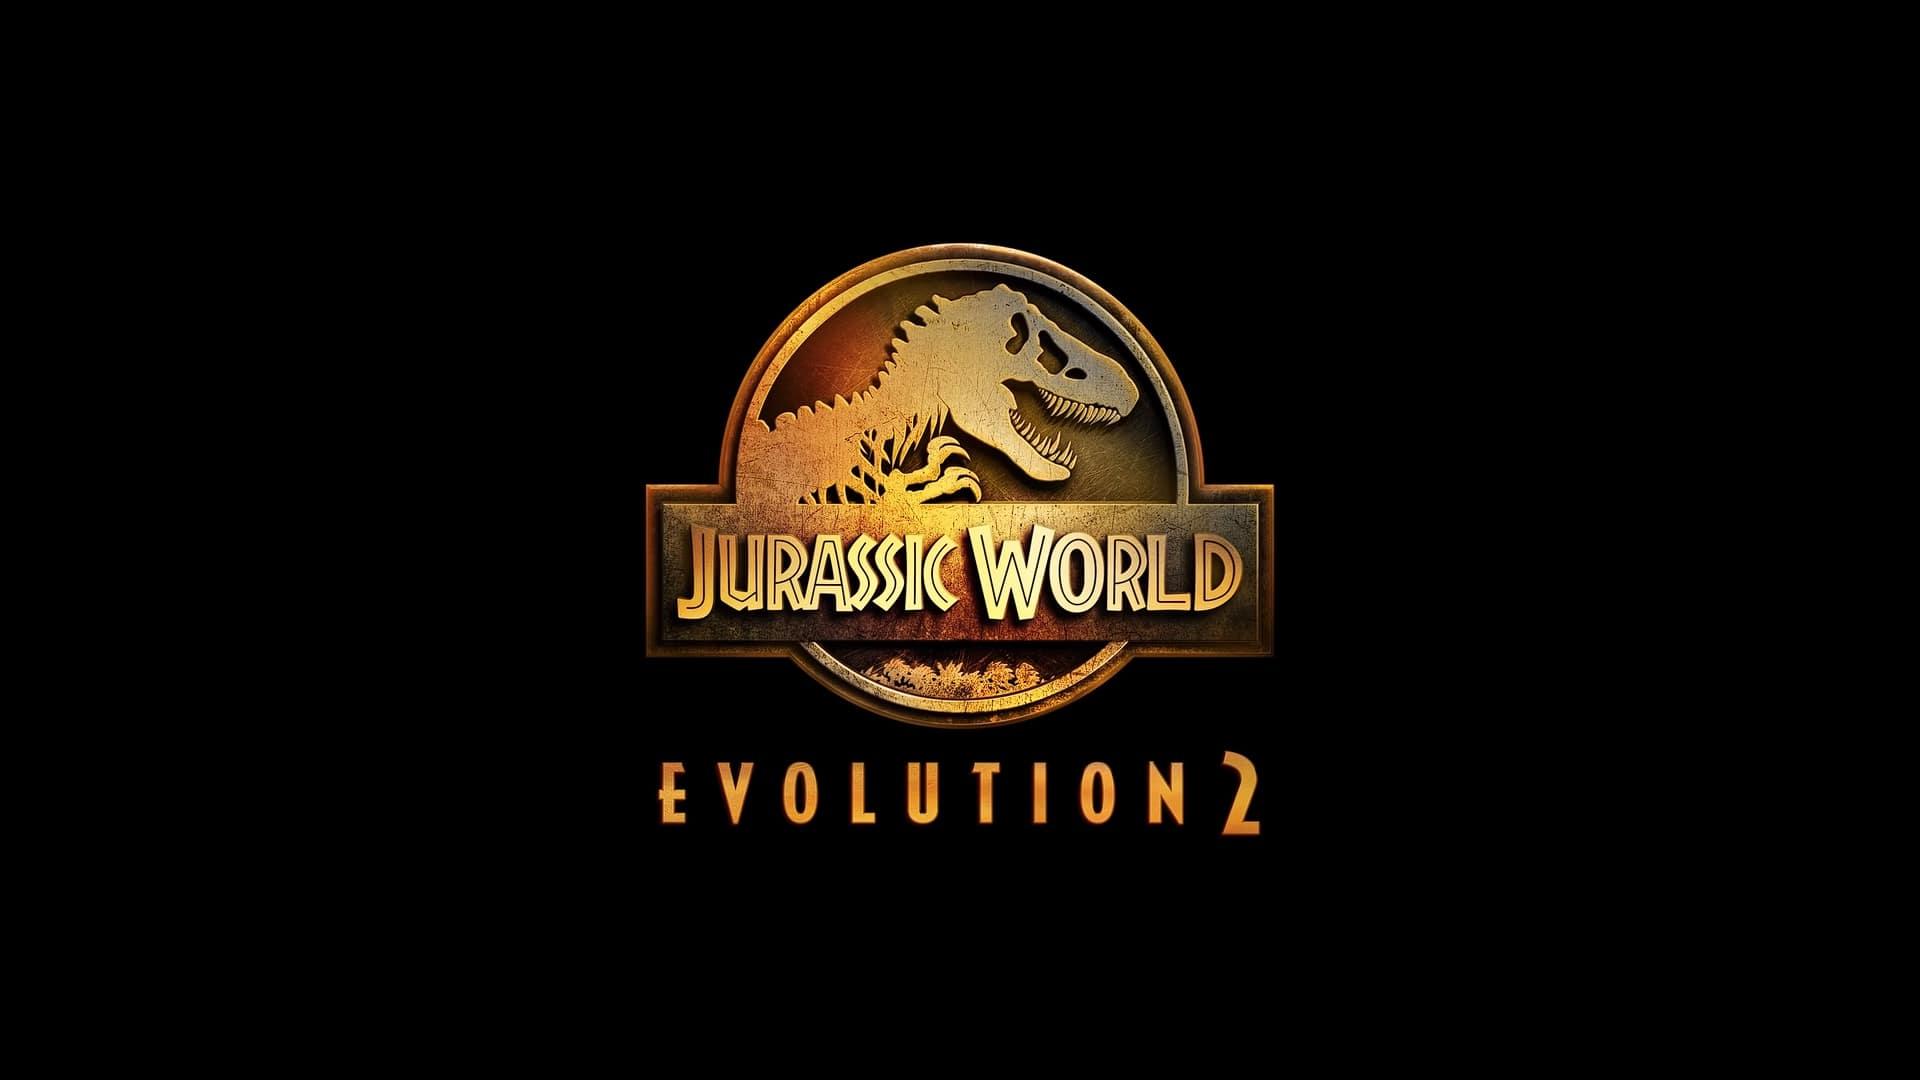 jurassic-world-evolution-2 (1)